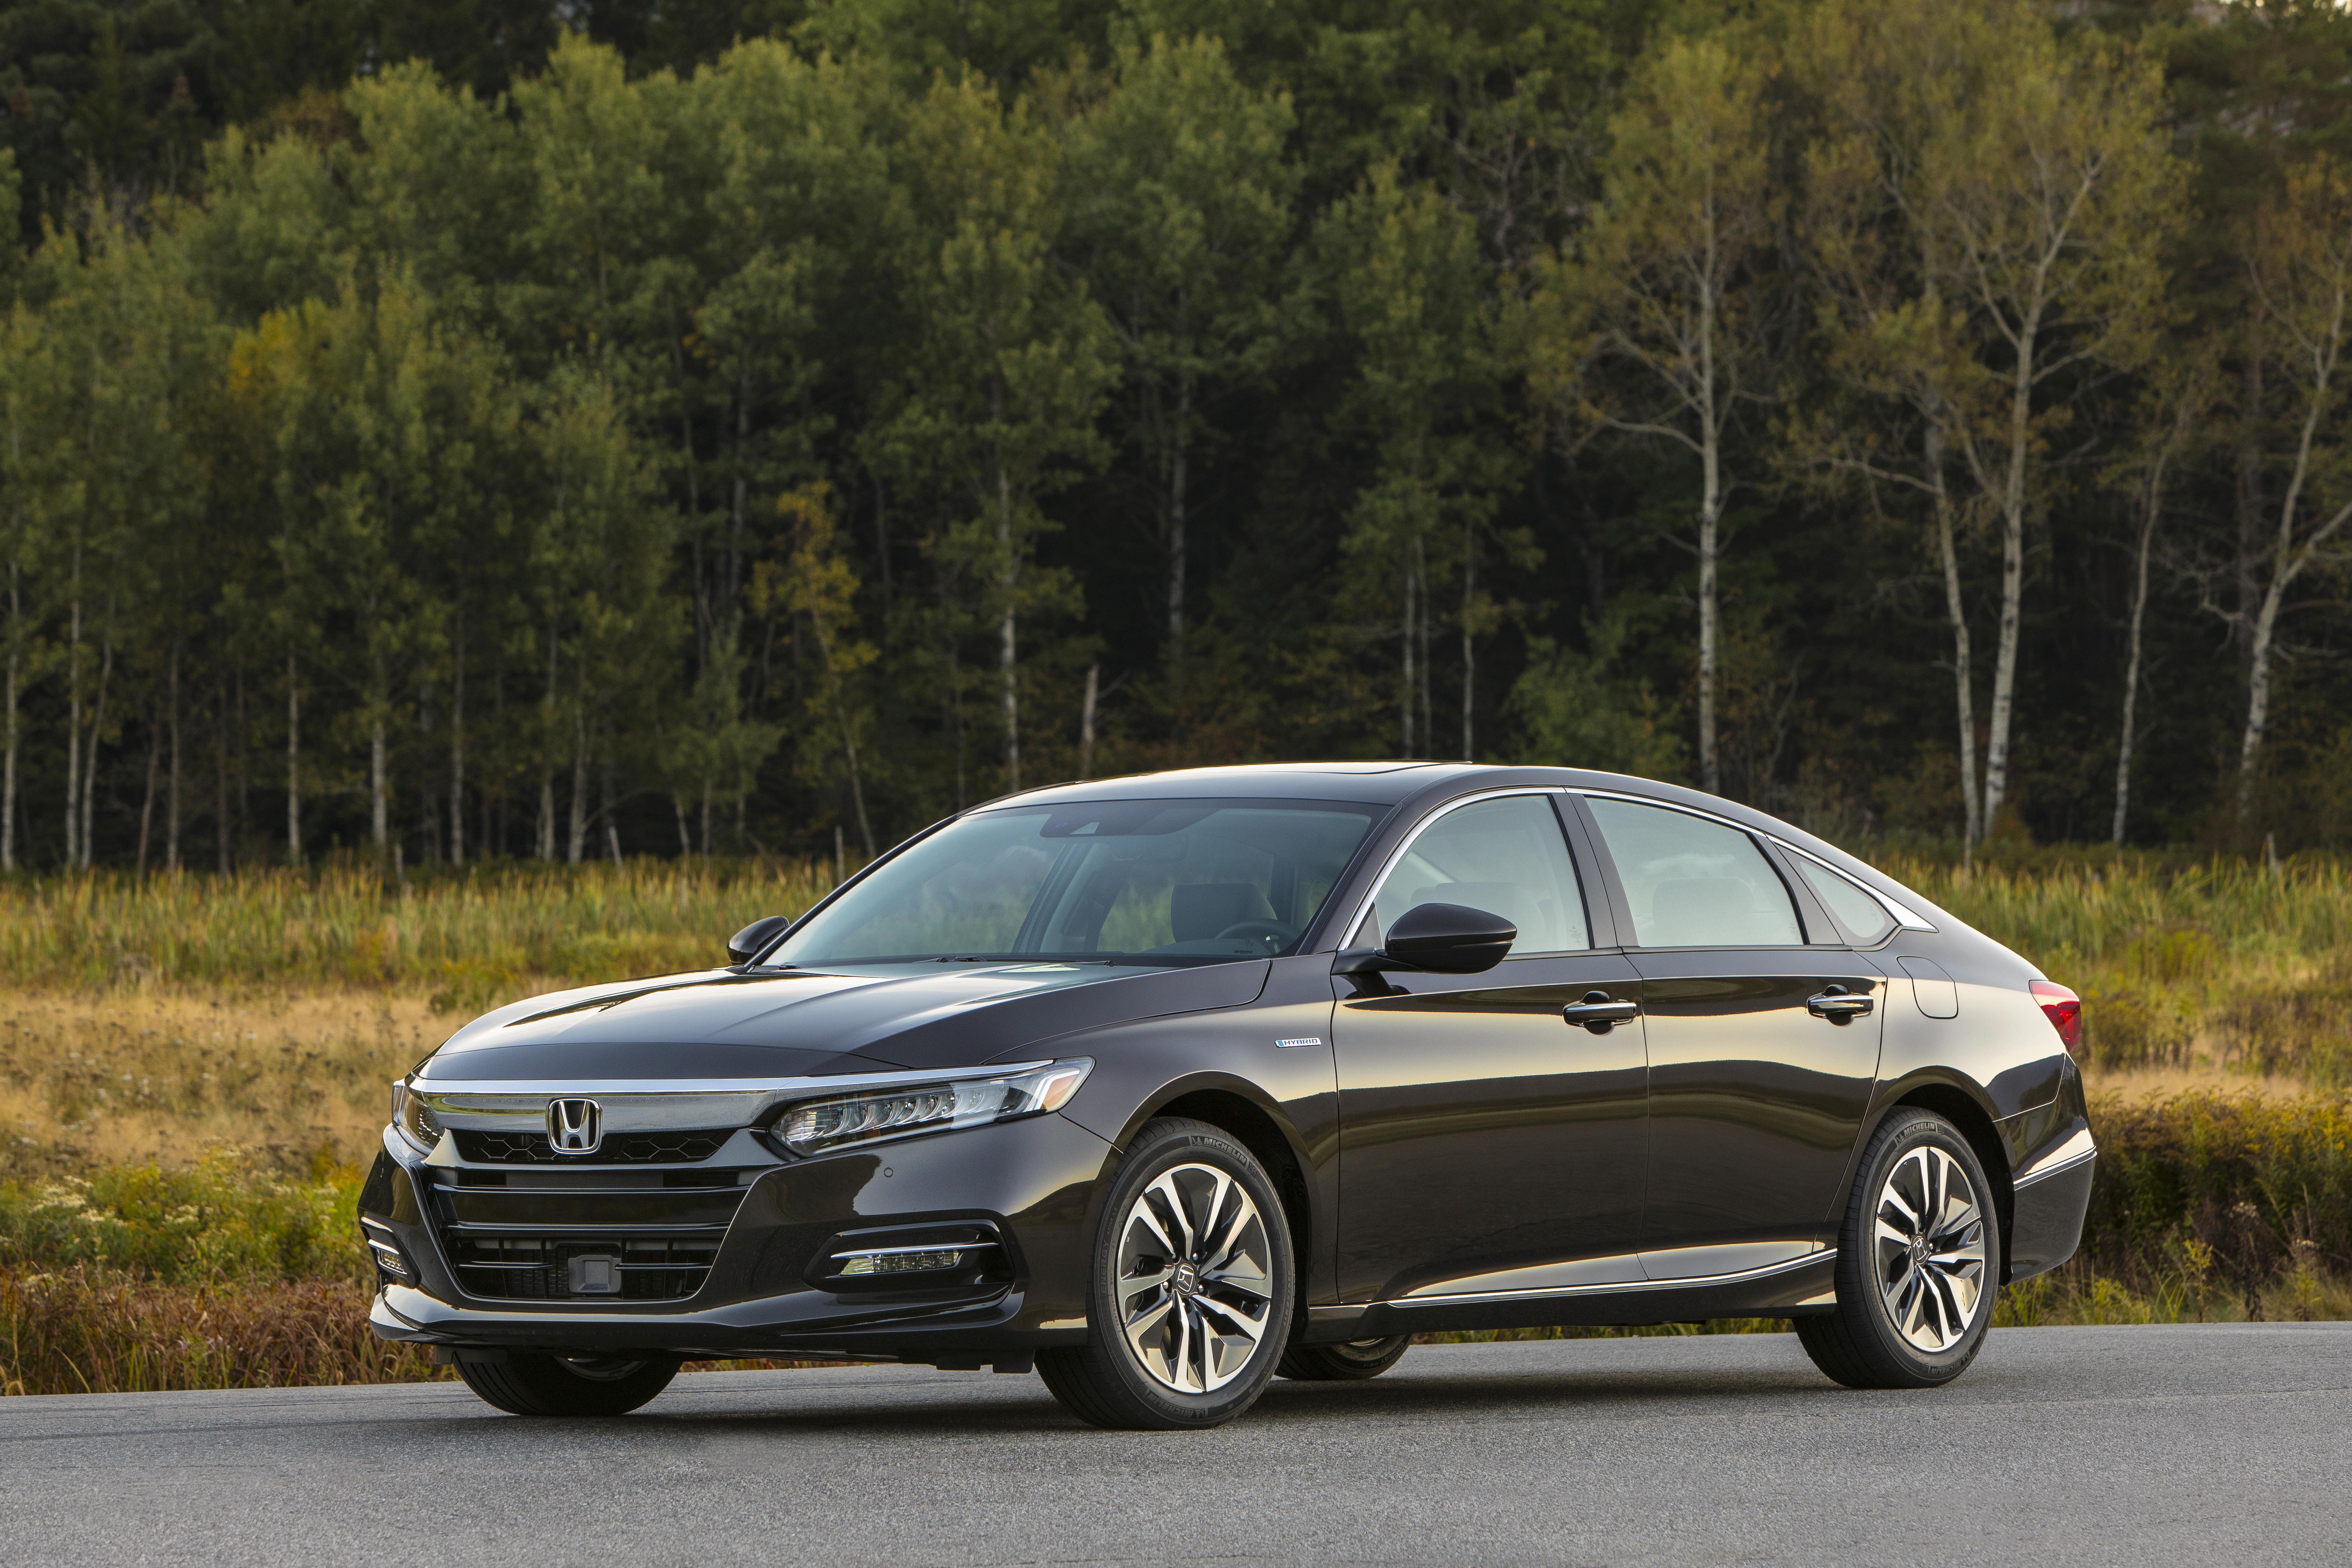 2018 Honda Accord Hybrid Starts at $25,990